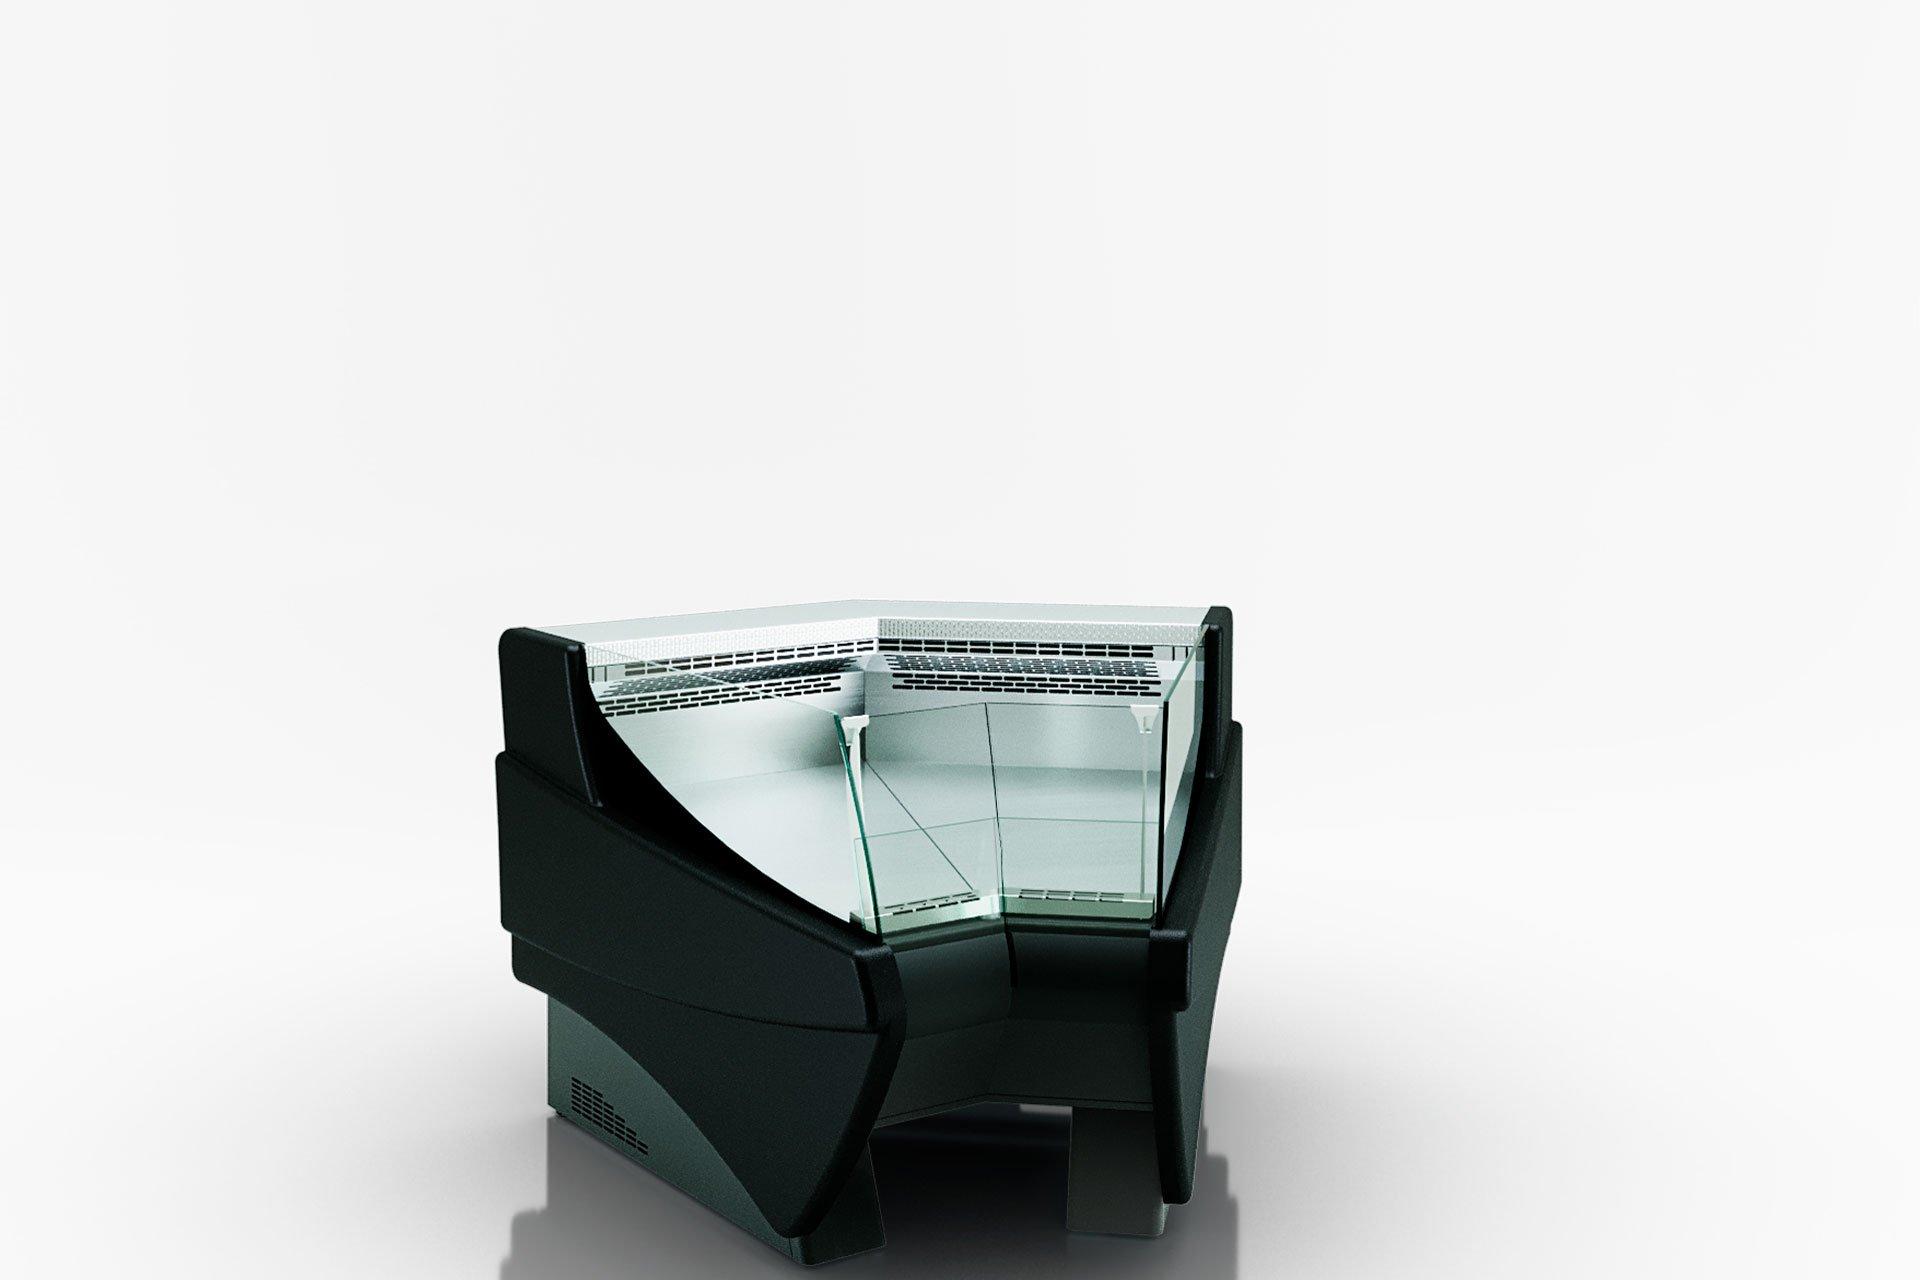 Kühlvitrinen Symphony luxe MG 120 deli self 085-DLM-IS45